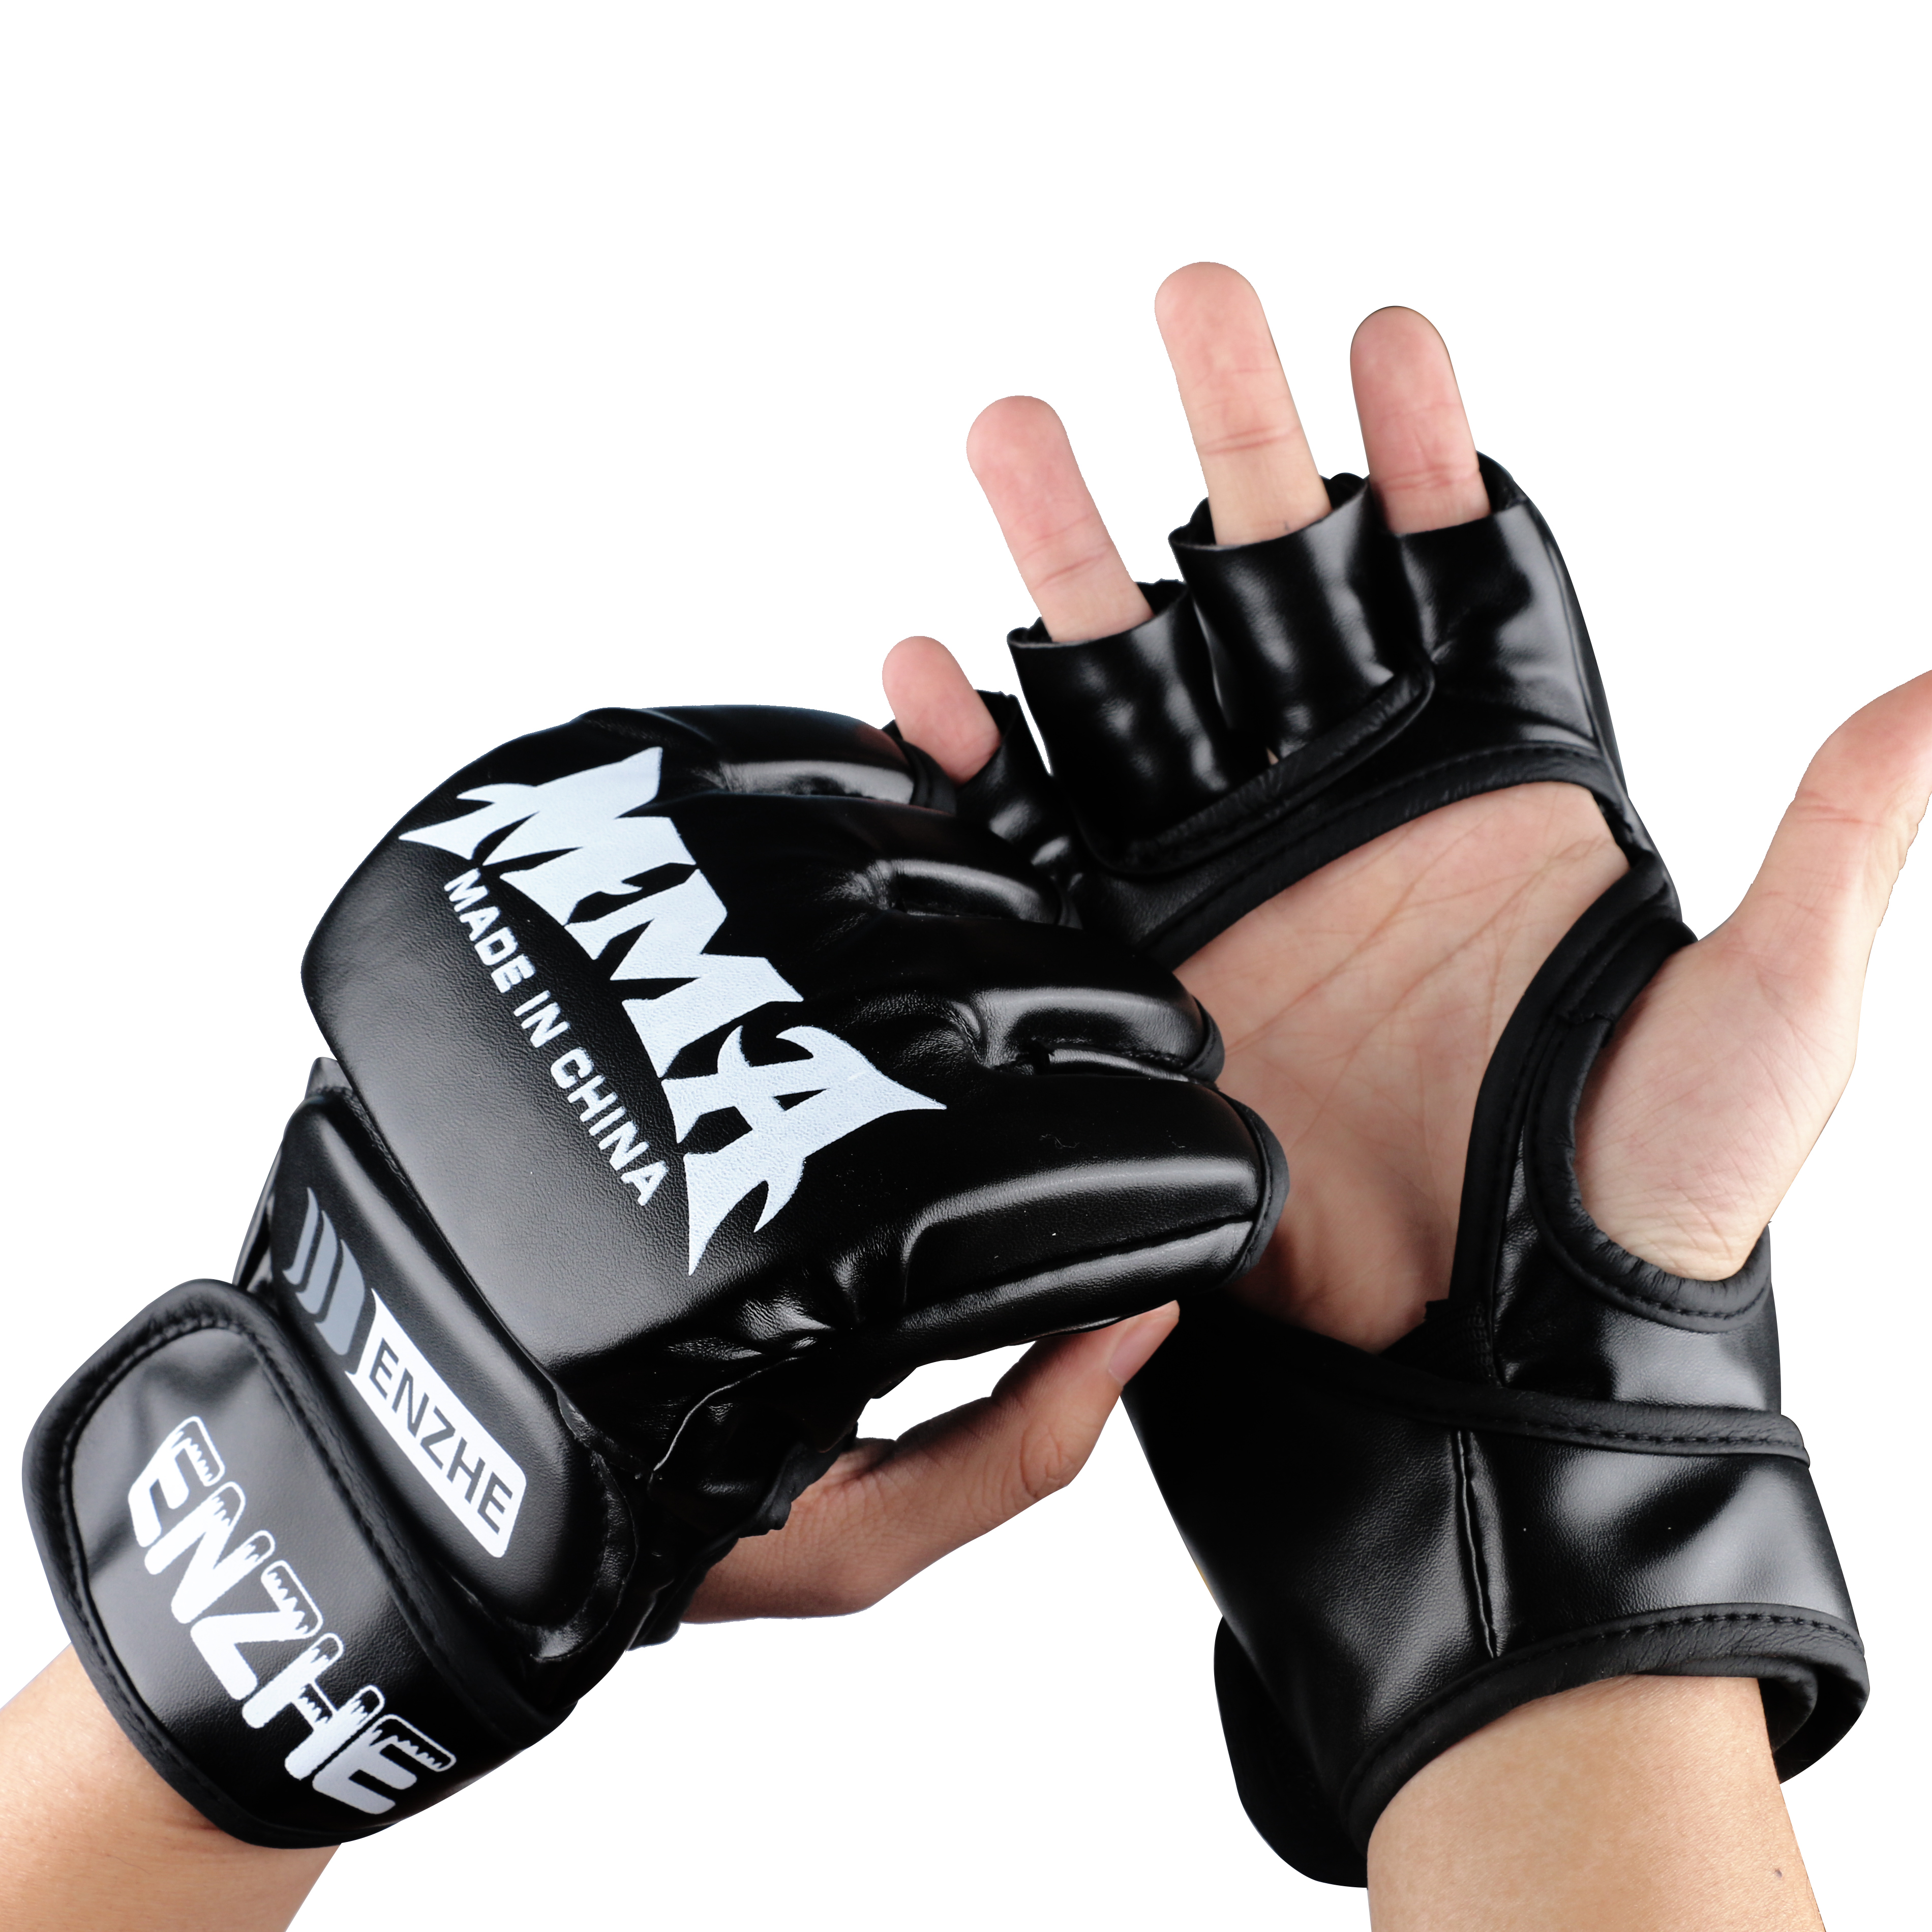 Luvas de Boxe Bolsa de Boxe Boxing para Treinamento de Luta pu de Couro Enzhe Luvas Meio Dedo Muay Thai Kick 1 Par Mma